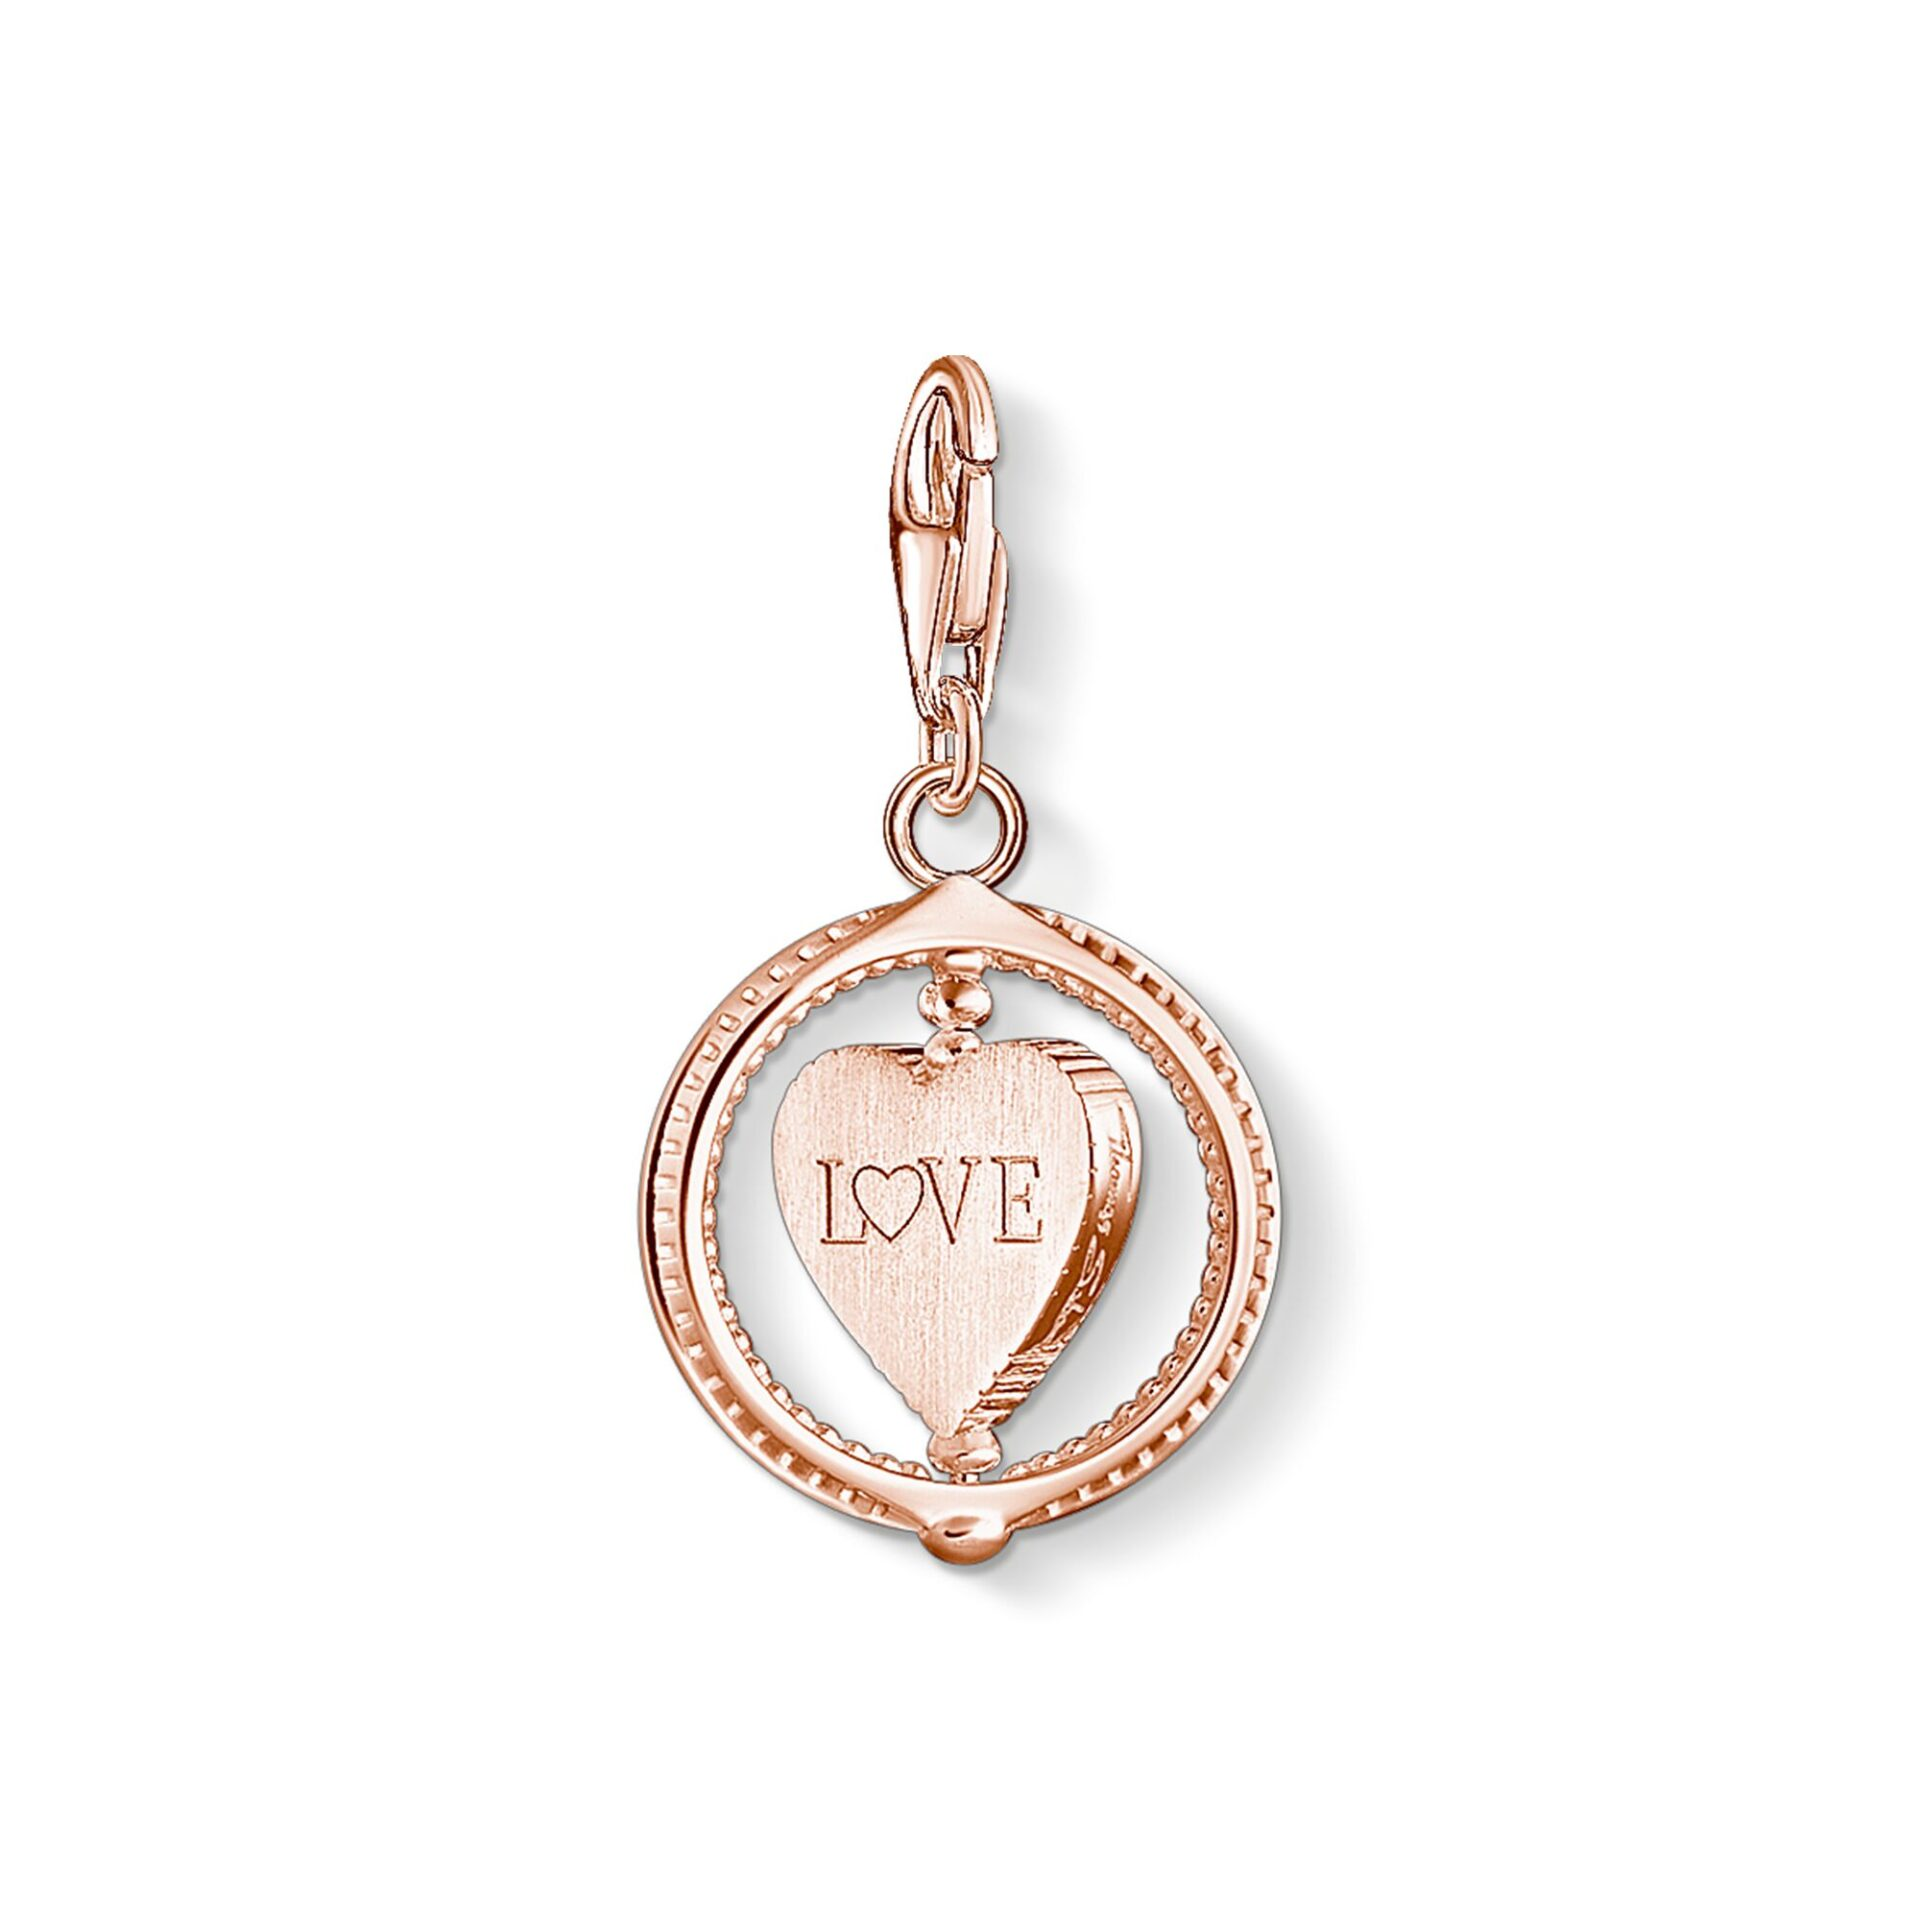 Pendentif Charm cœur avec pavé or rose, Thomas Sabo